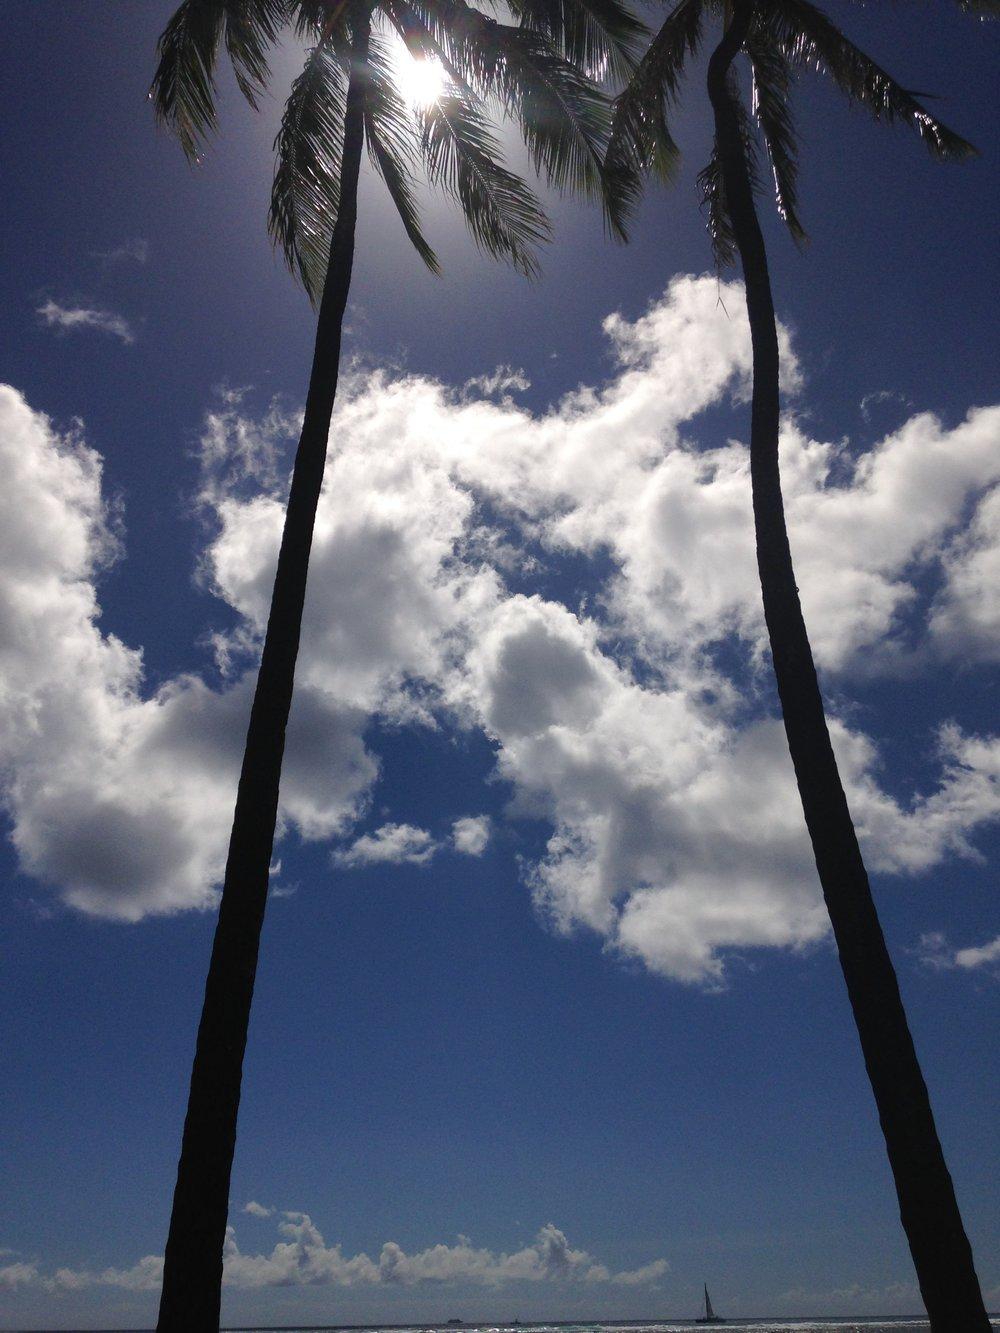 Yukari Kunisue Life Coaching in Hawaii